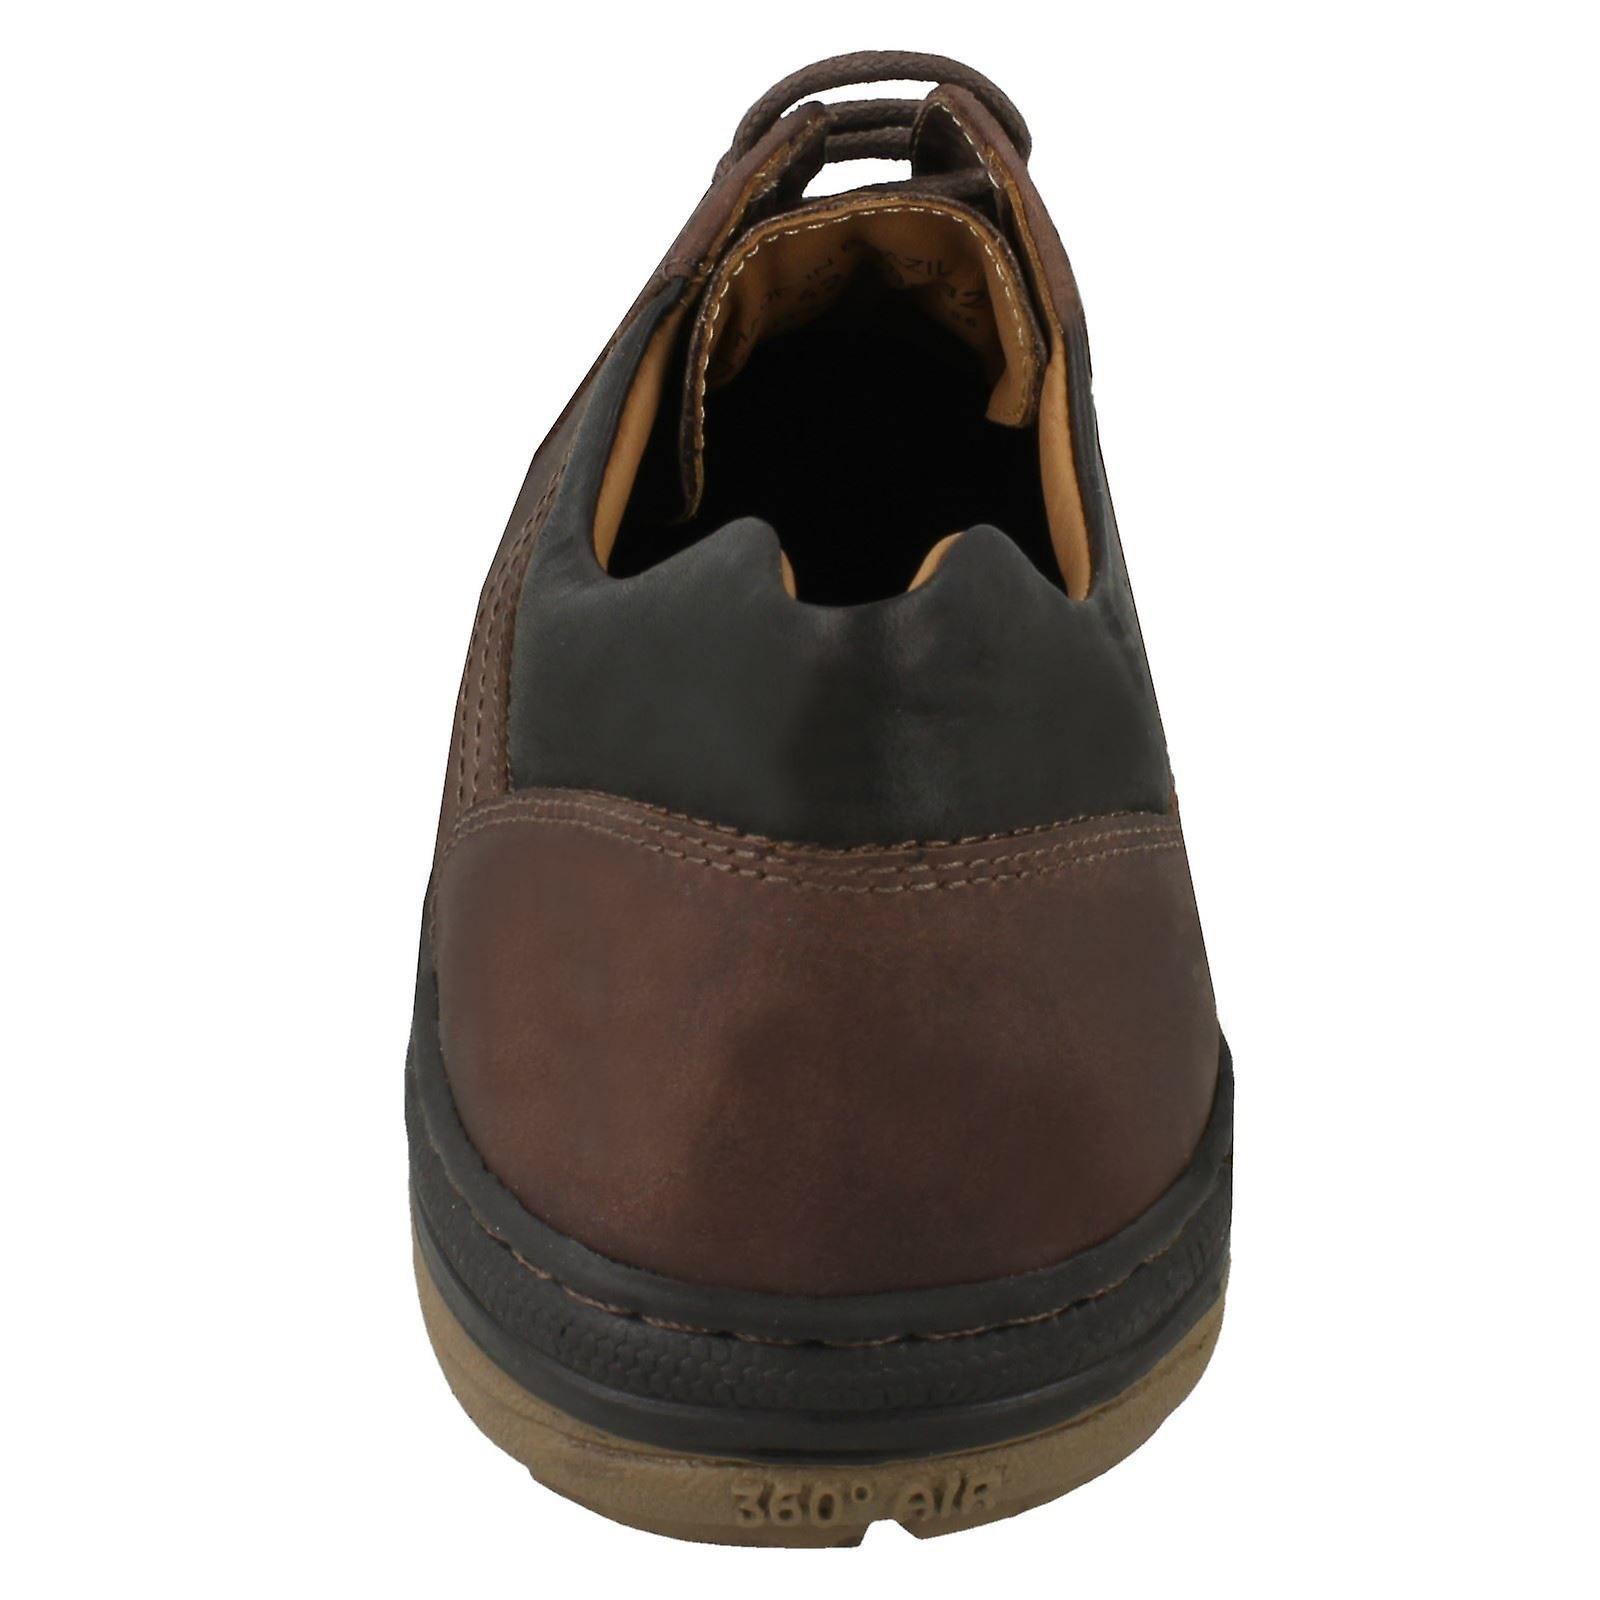 Mens Anatomique & Co Casual Chaussures Gurupi 101022